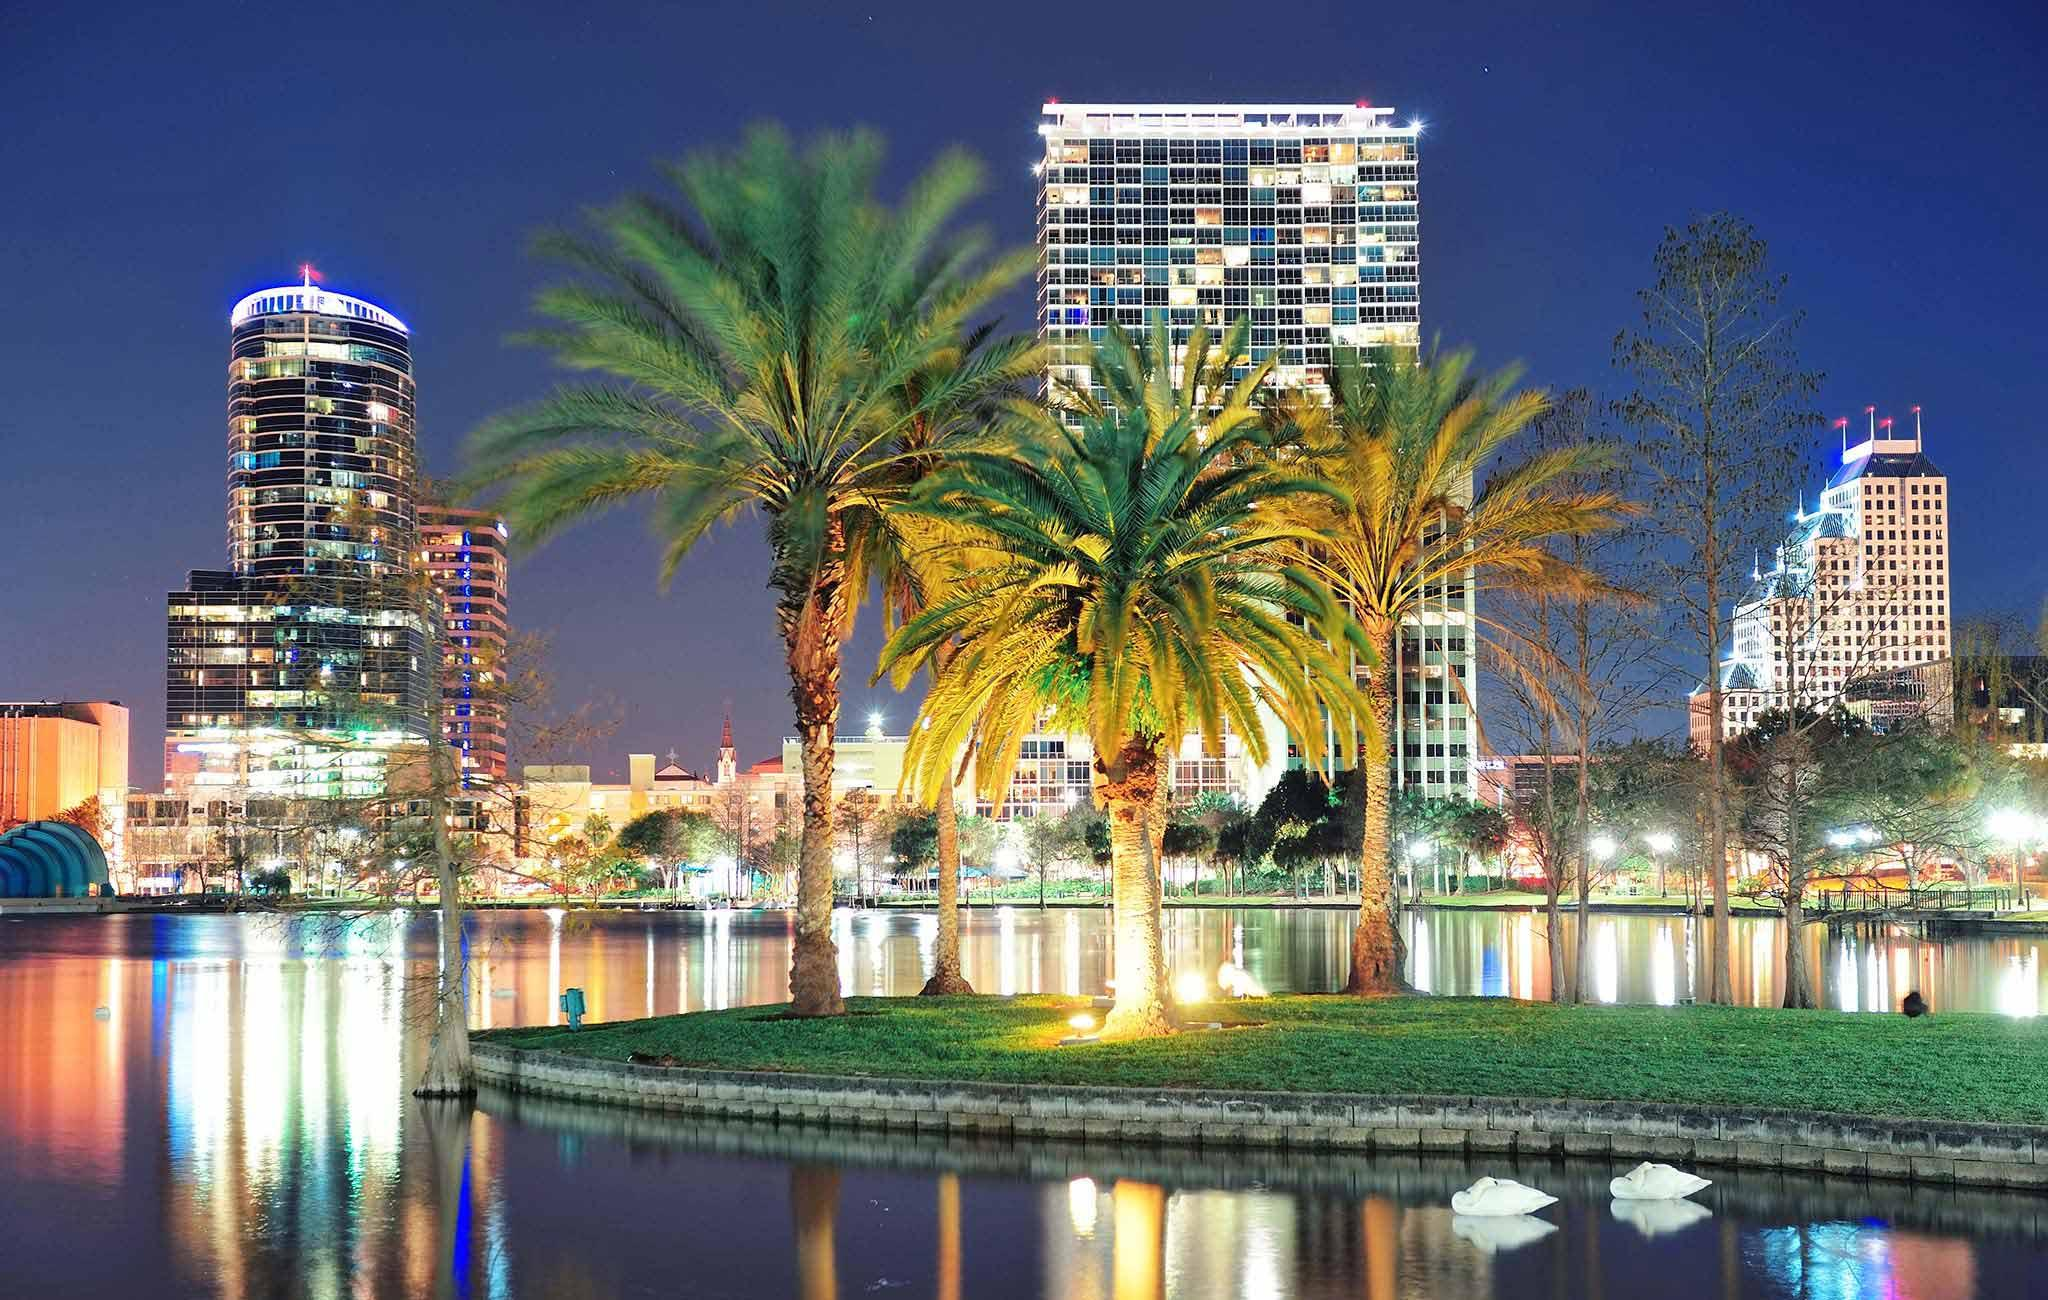 USA Miami Orlando with Disney Washington Niagara